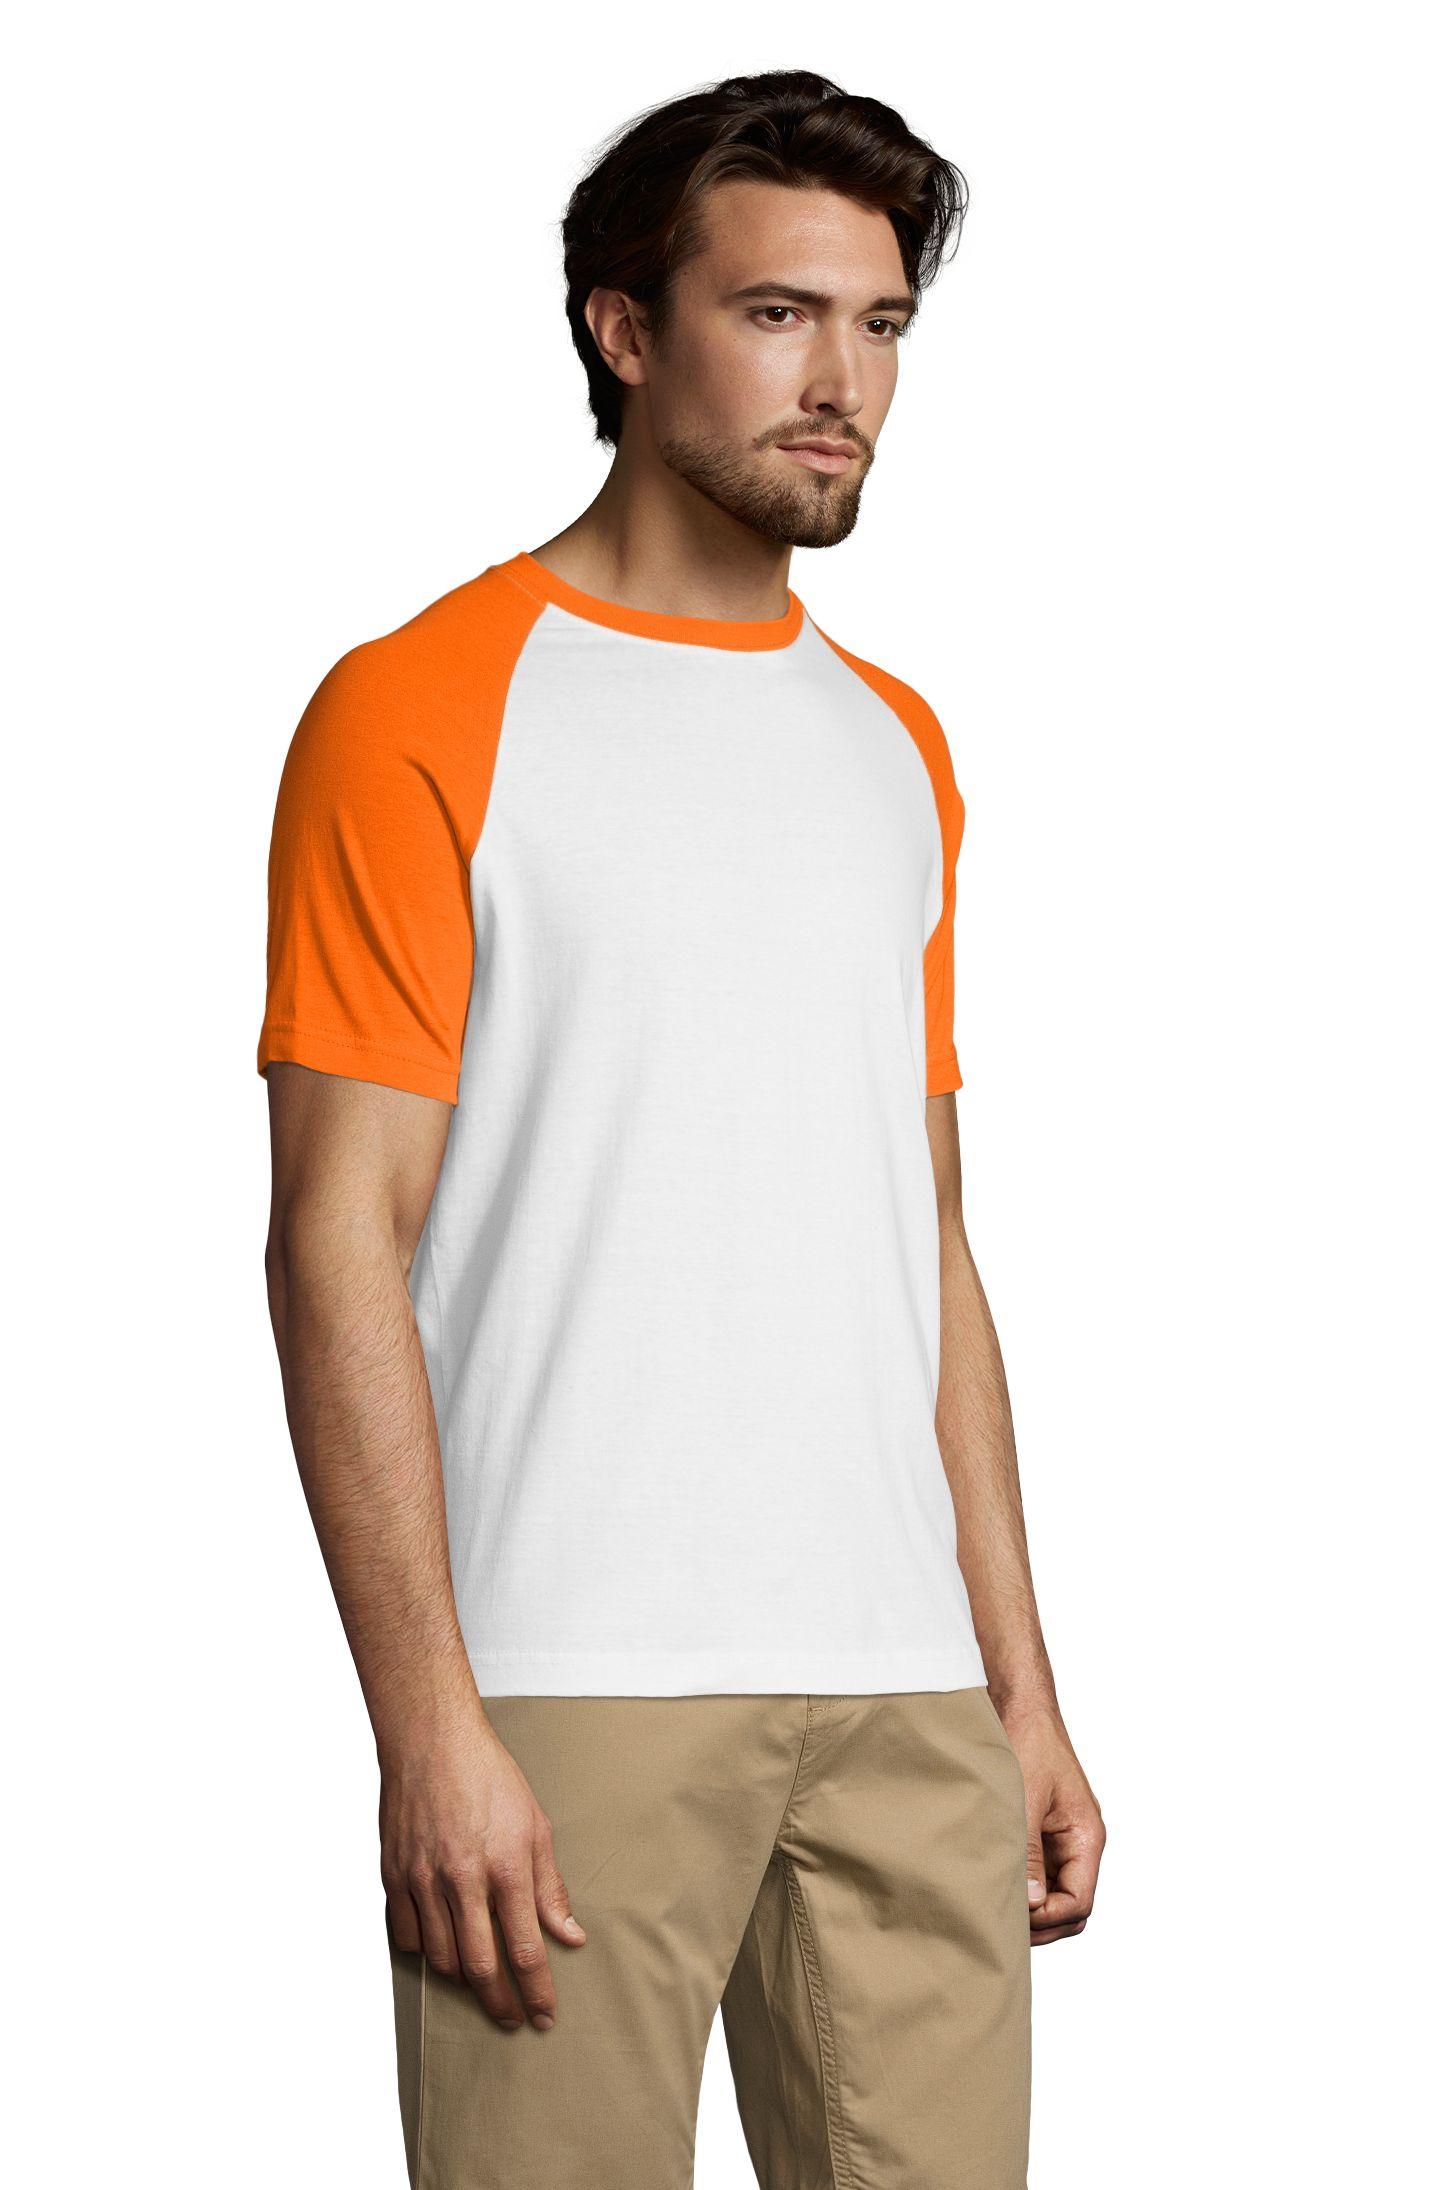 981 - Blanc / Orange